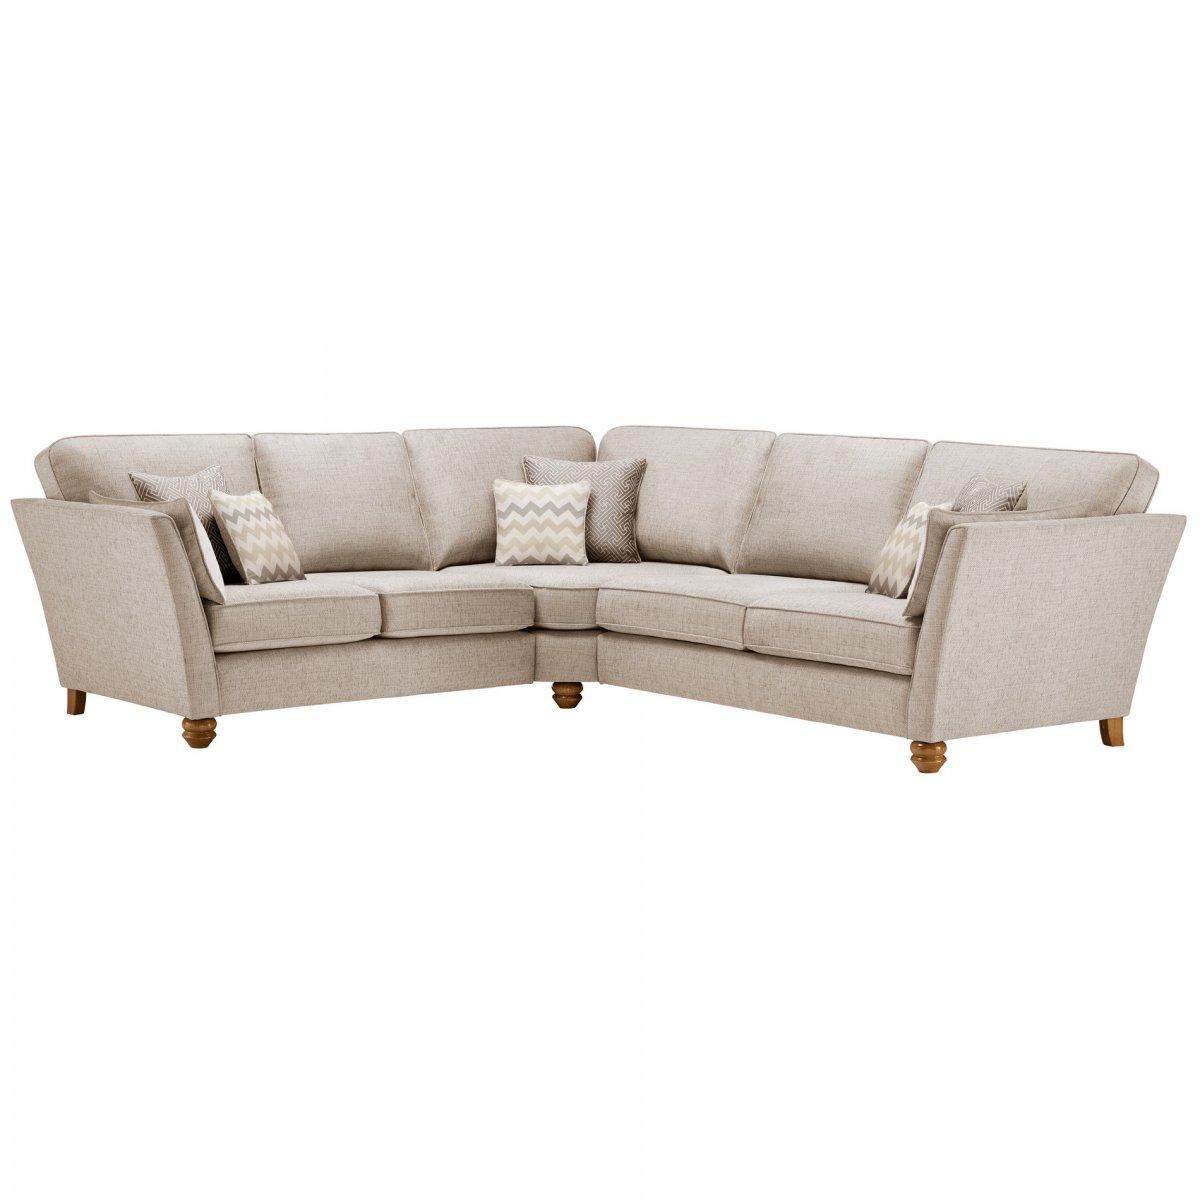 gainsborough large corner sofa in beige beige scatters